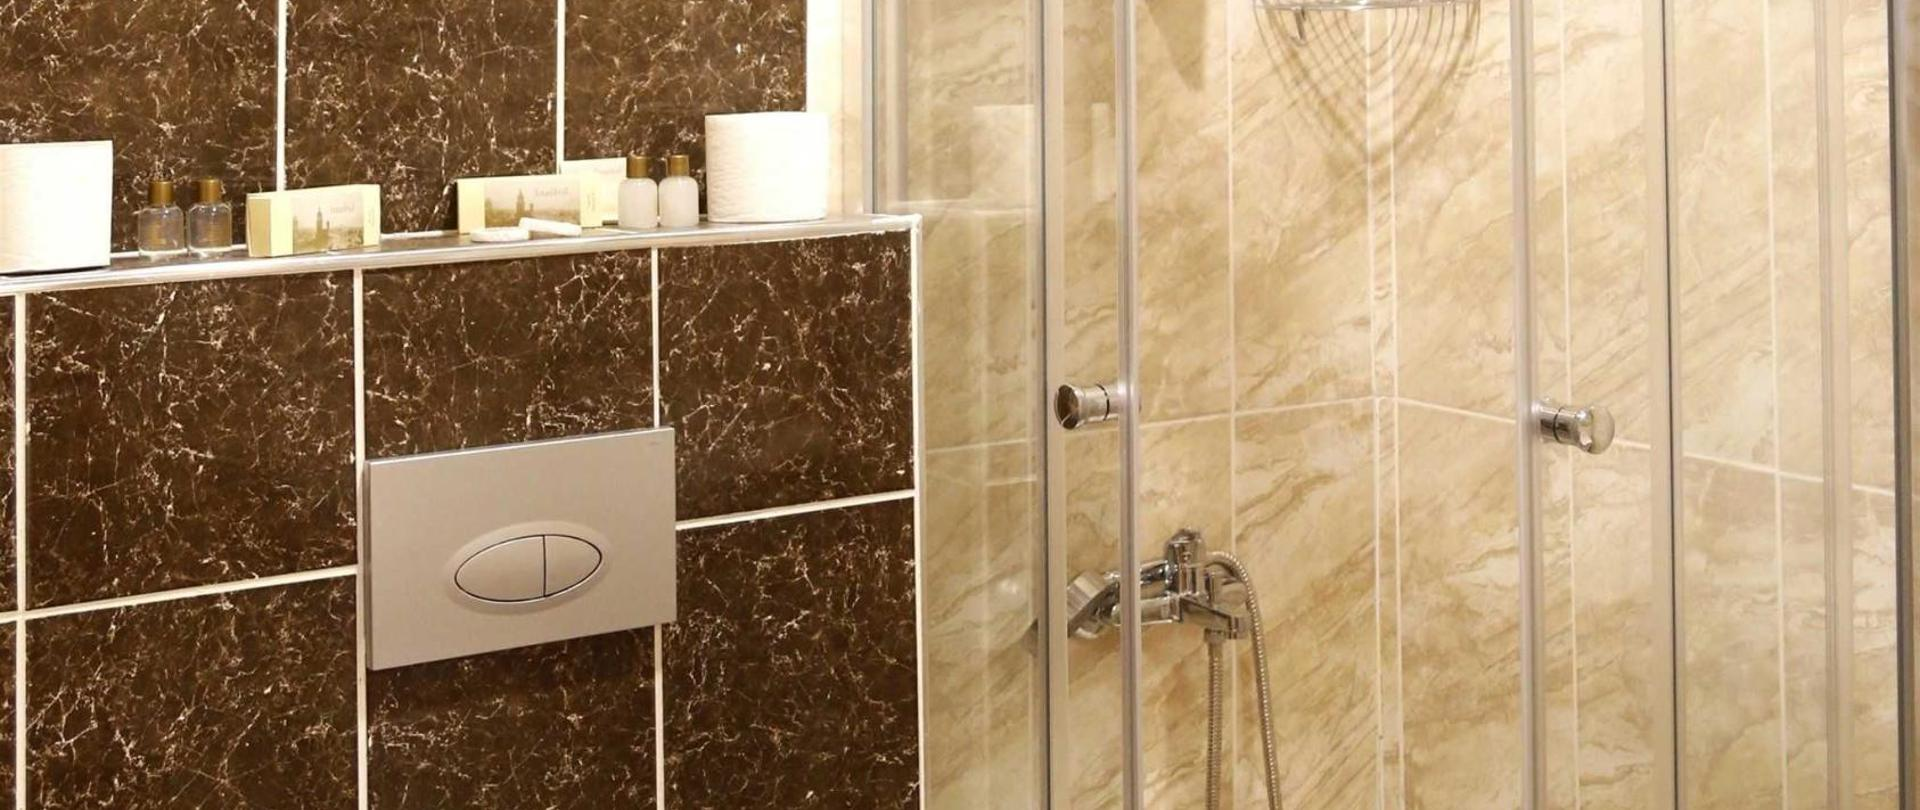 banyolar-5-2845-x-3456.jpg